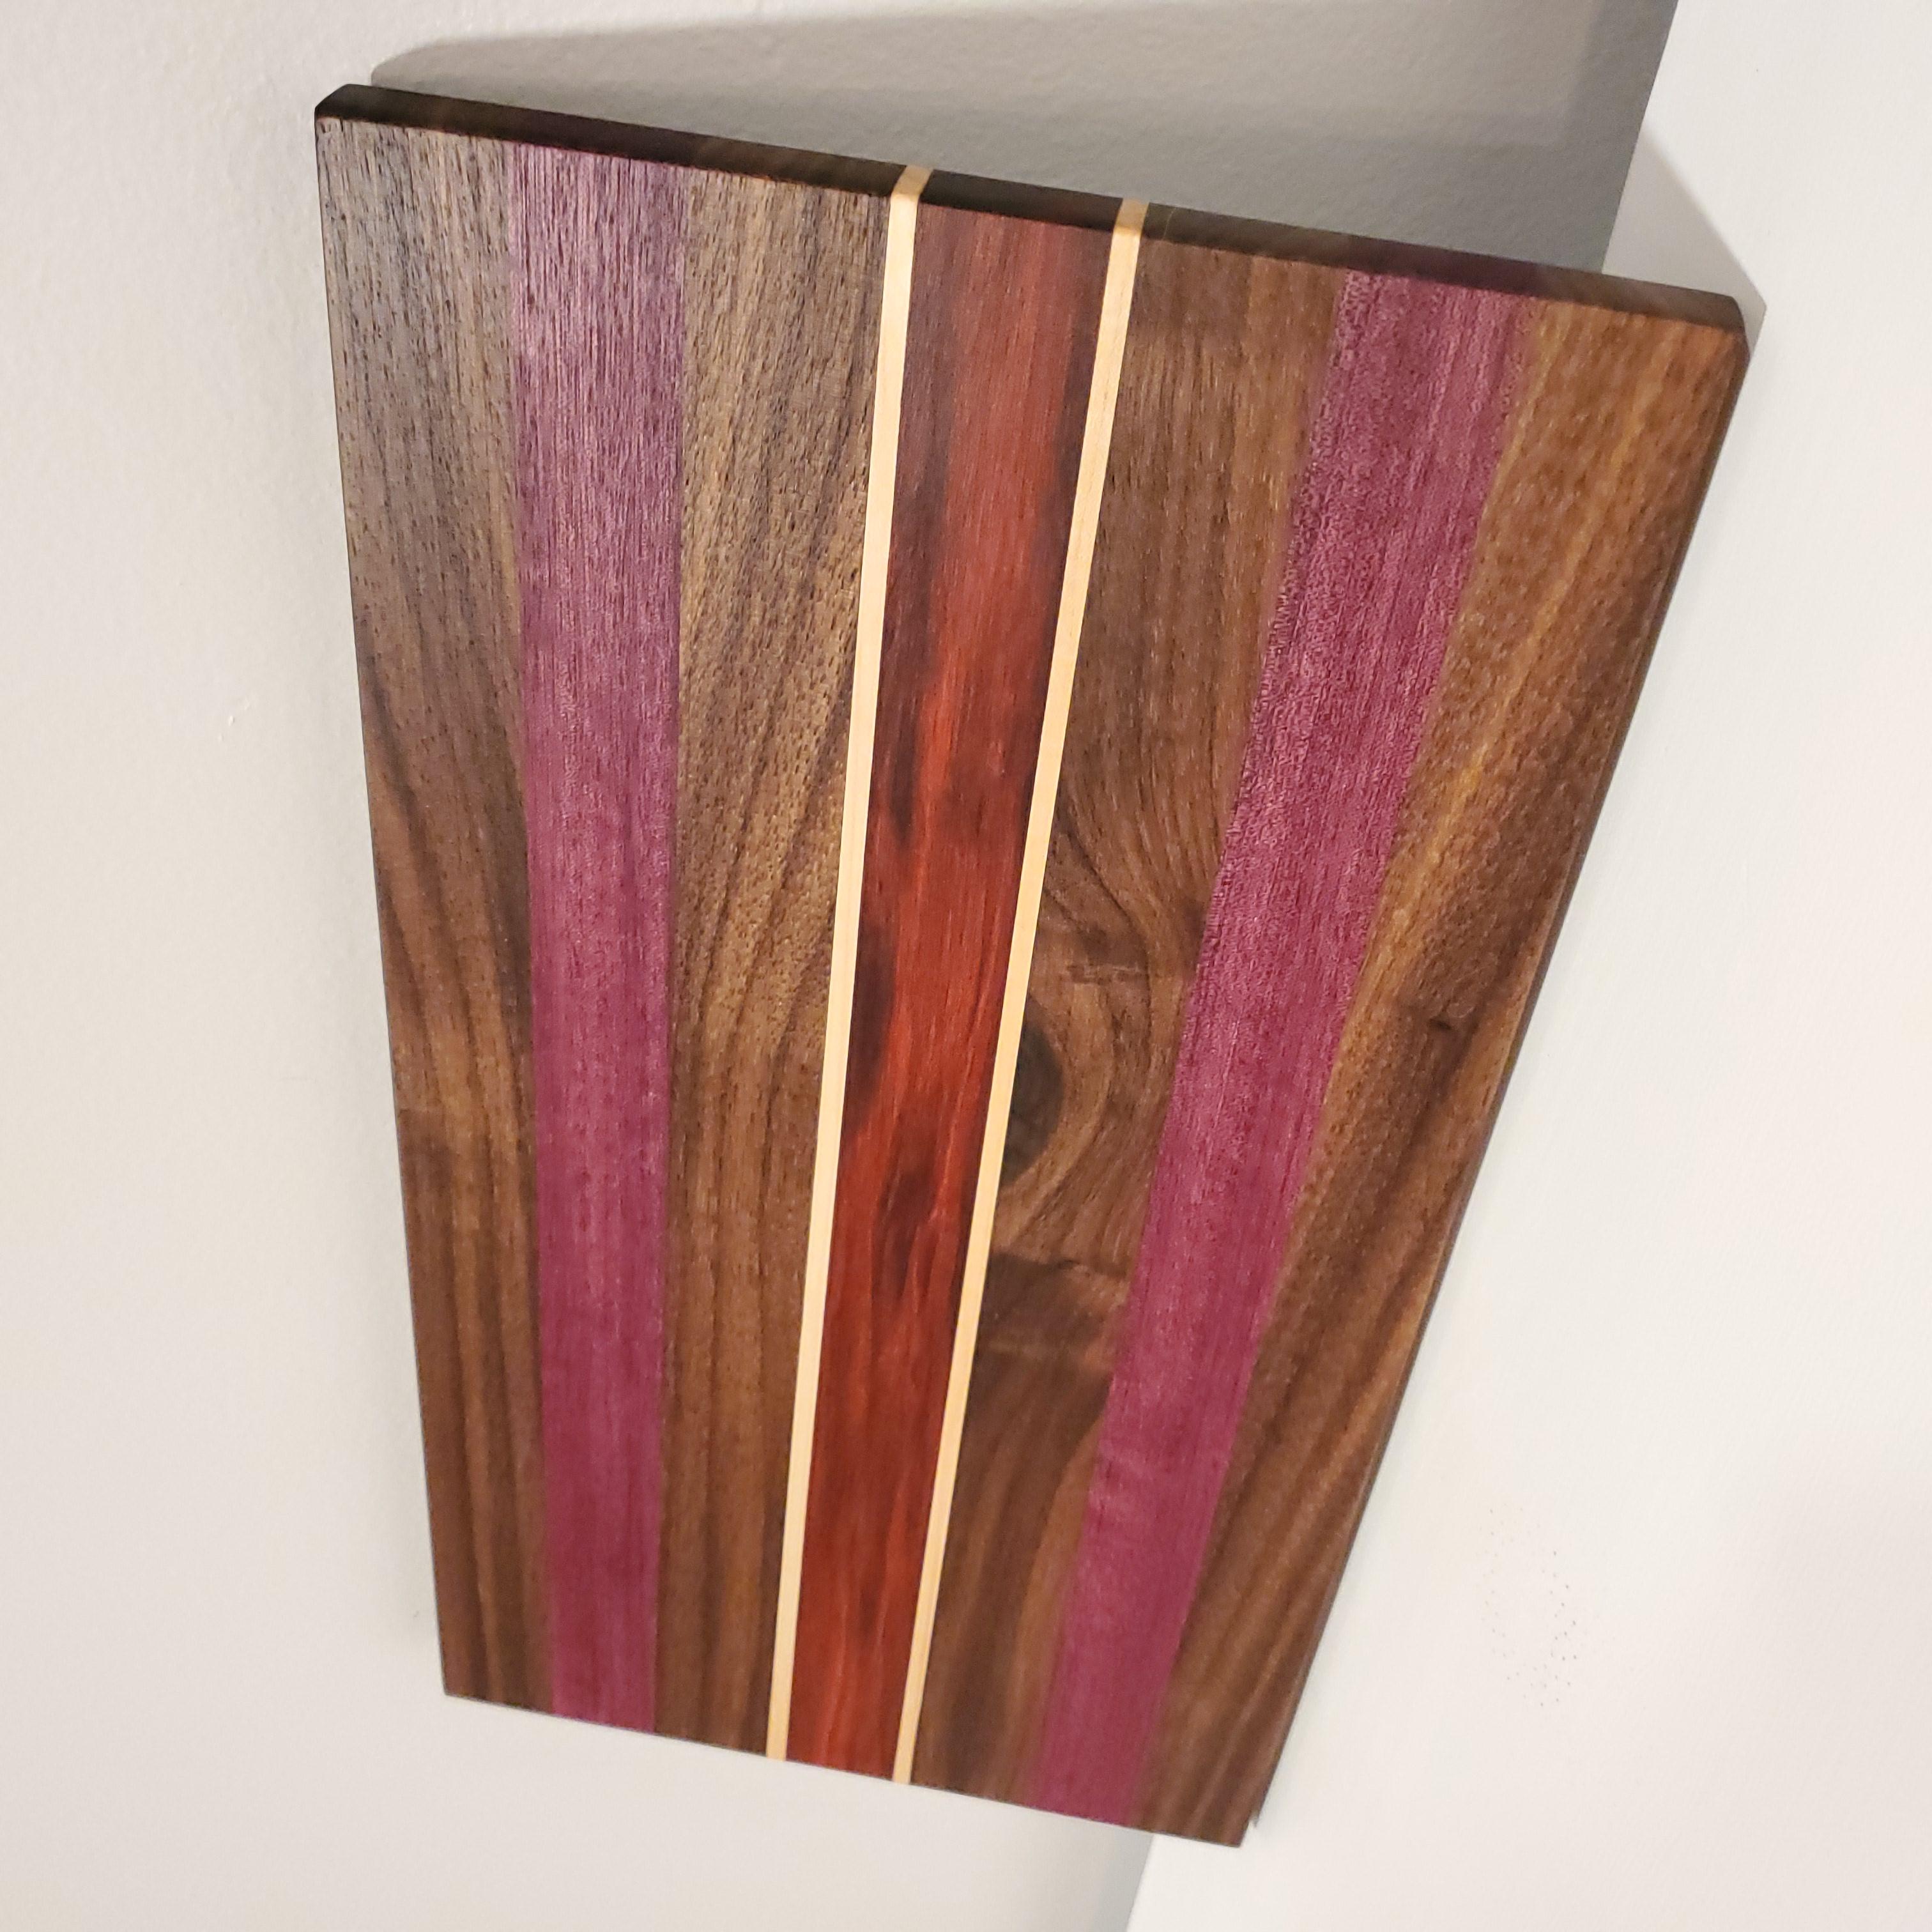 Cutting Board - Walnut, Redheart, Purpleheart & Maple